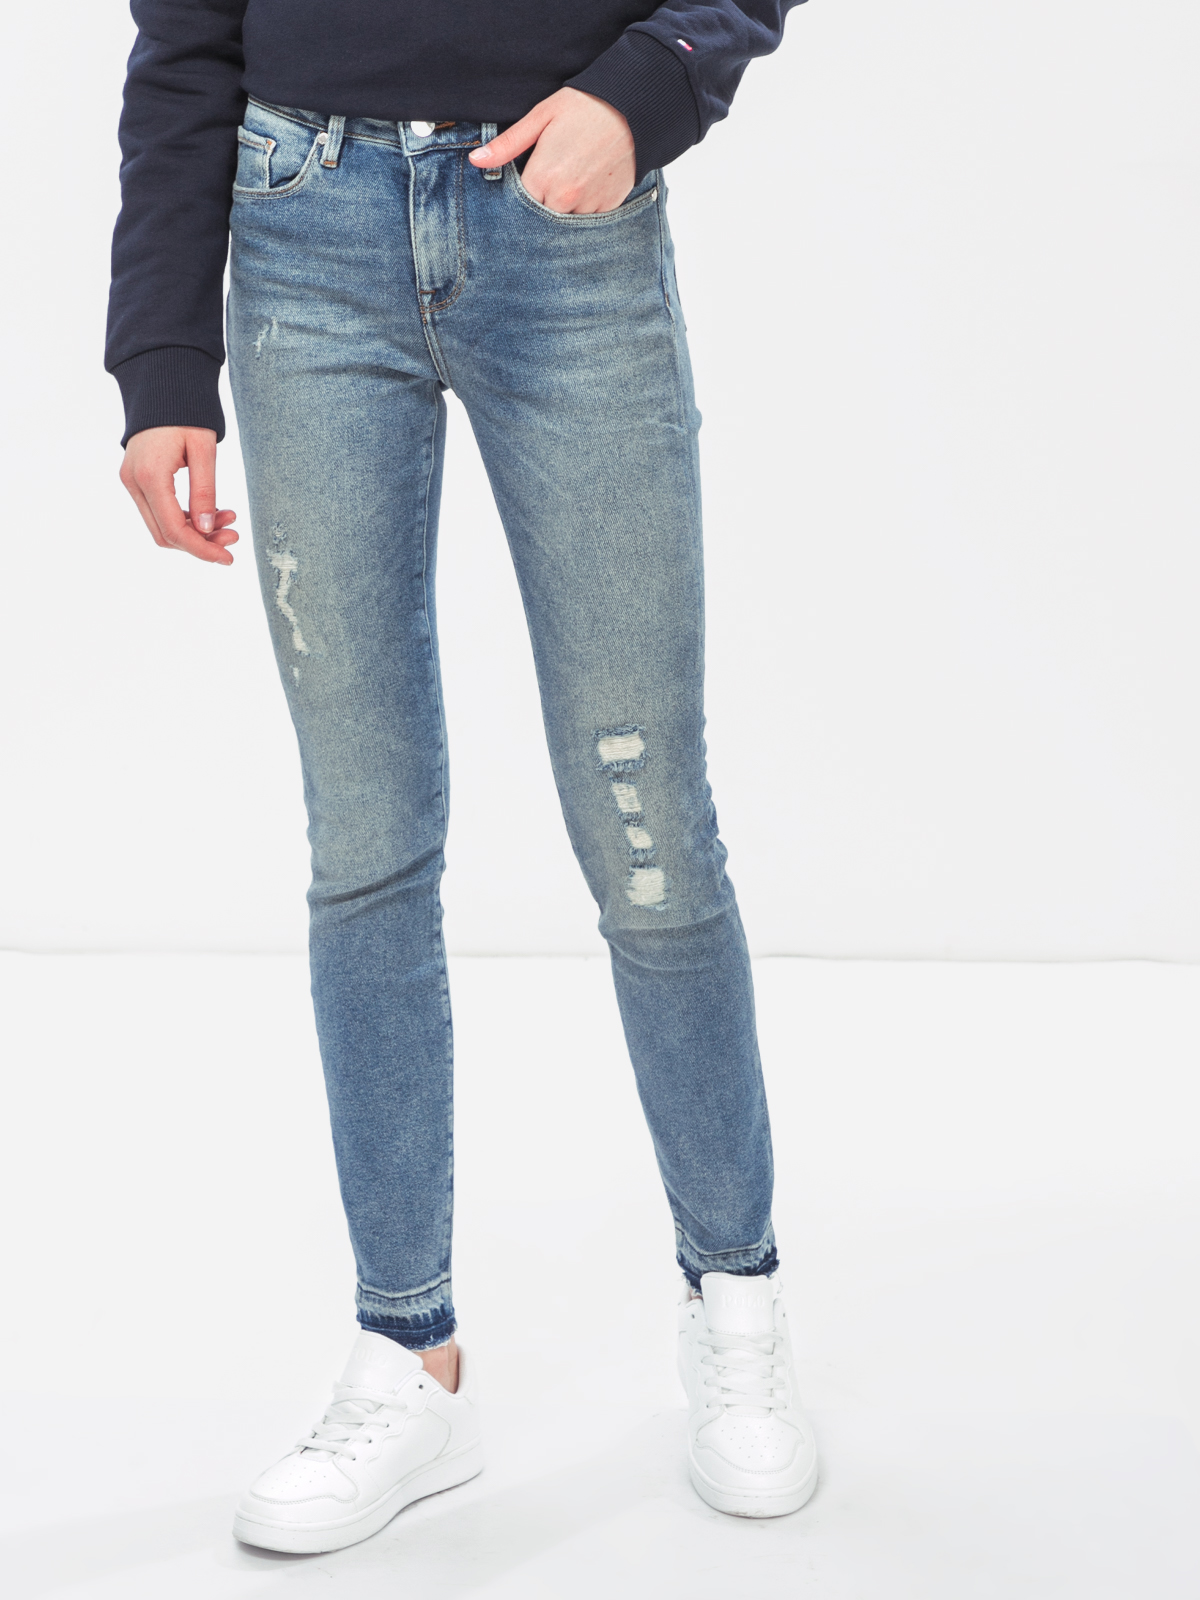 edc741aab49 Como, naiste teksad tommy hilfiger | Newmood